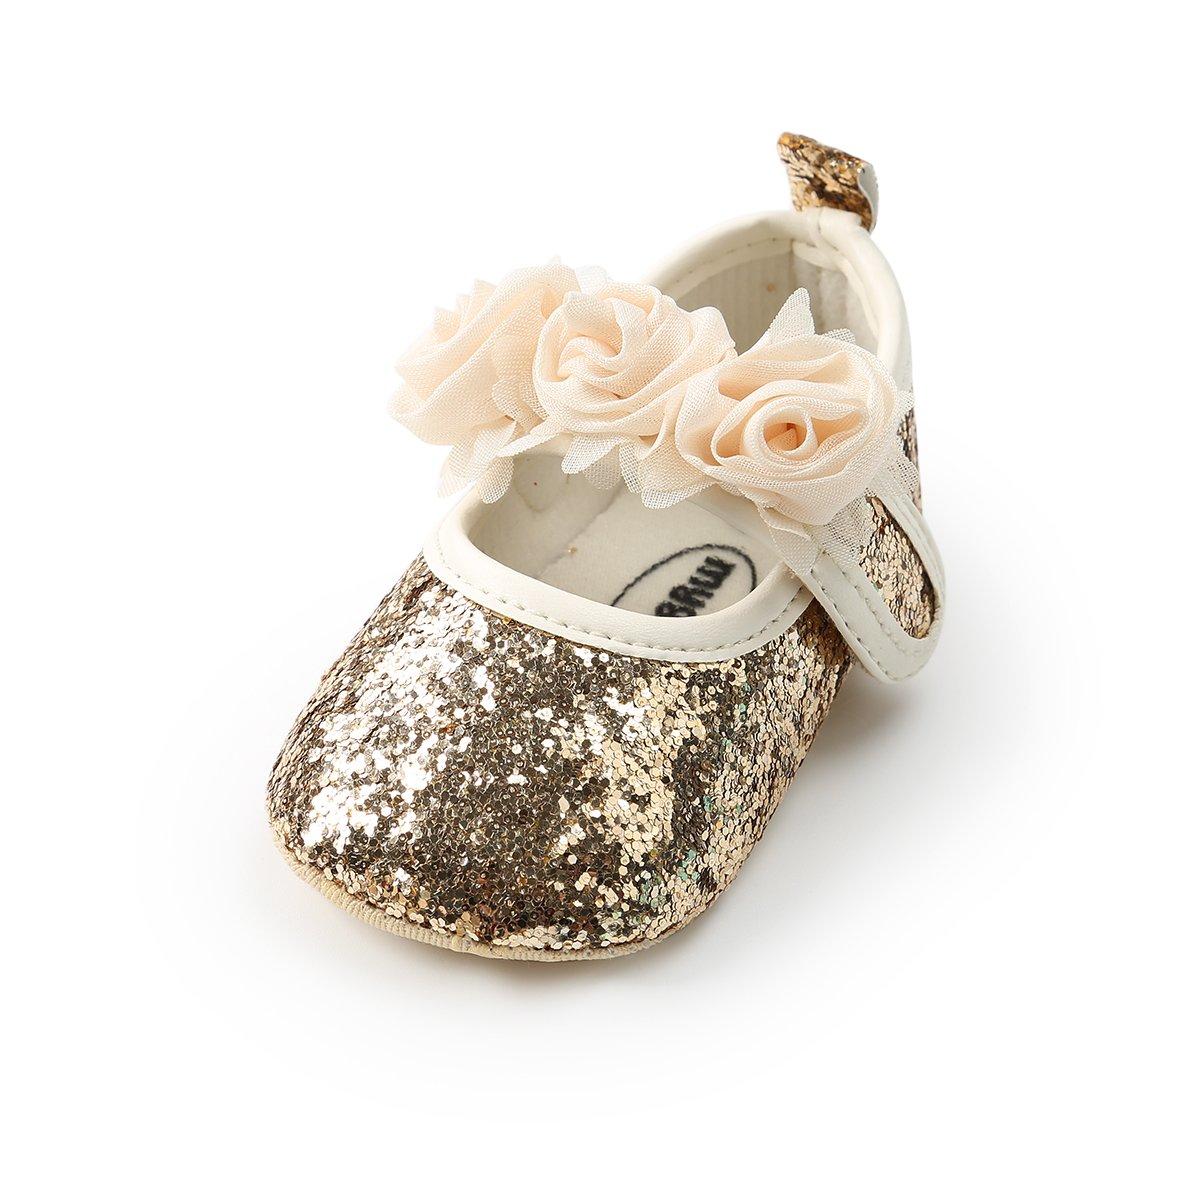 Baby Girl Moccasins Princess Sparkly Premium Lightweight Soft Sole Prewalker Toddler Shoes (L:12-18 Months, 1816-Gold)